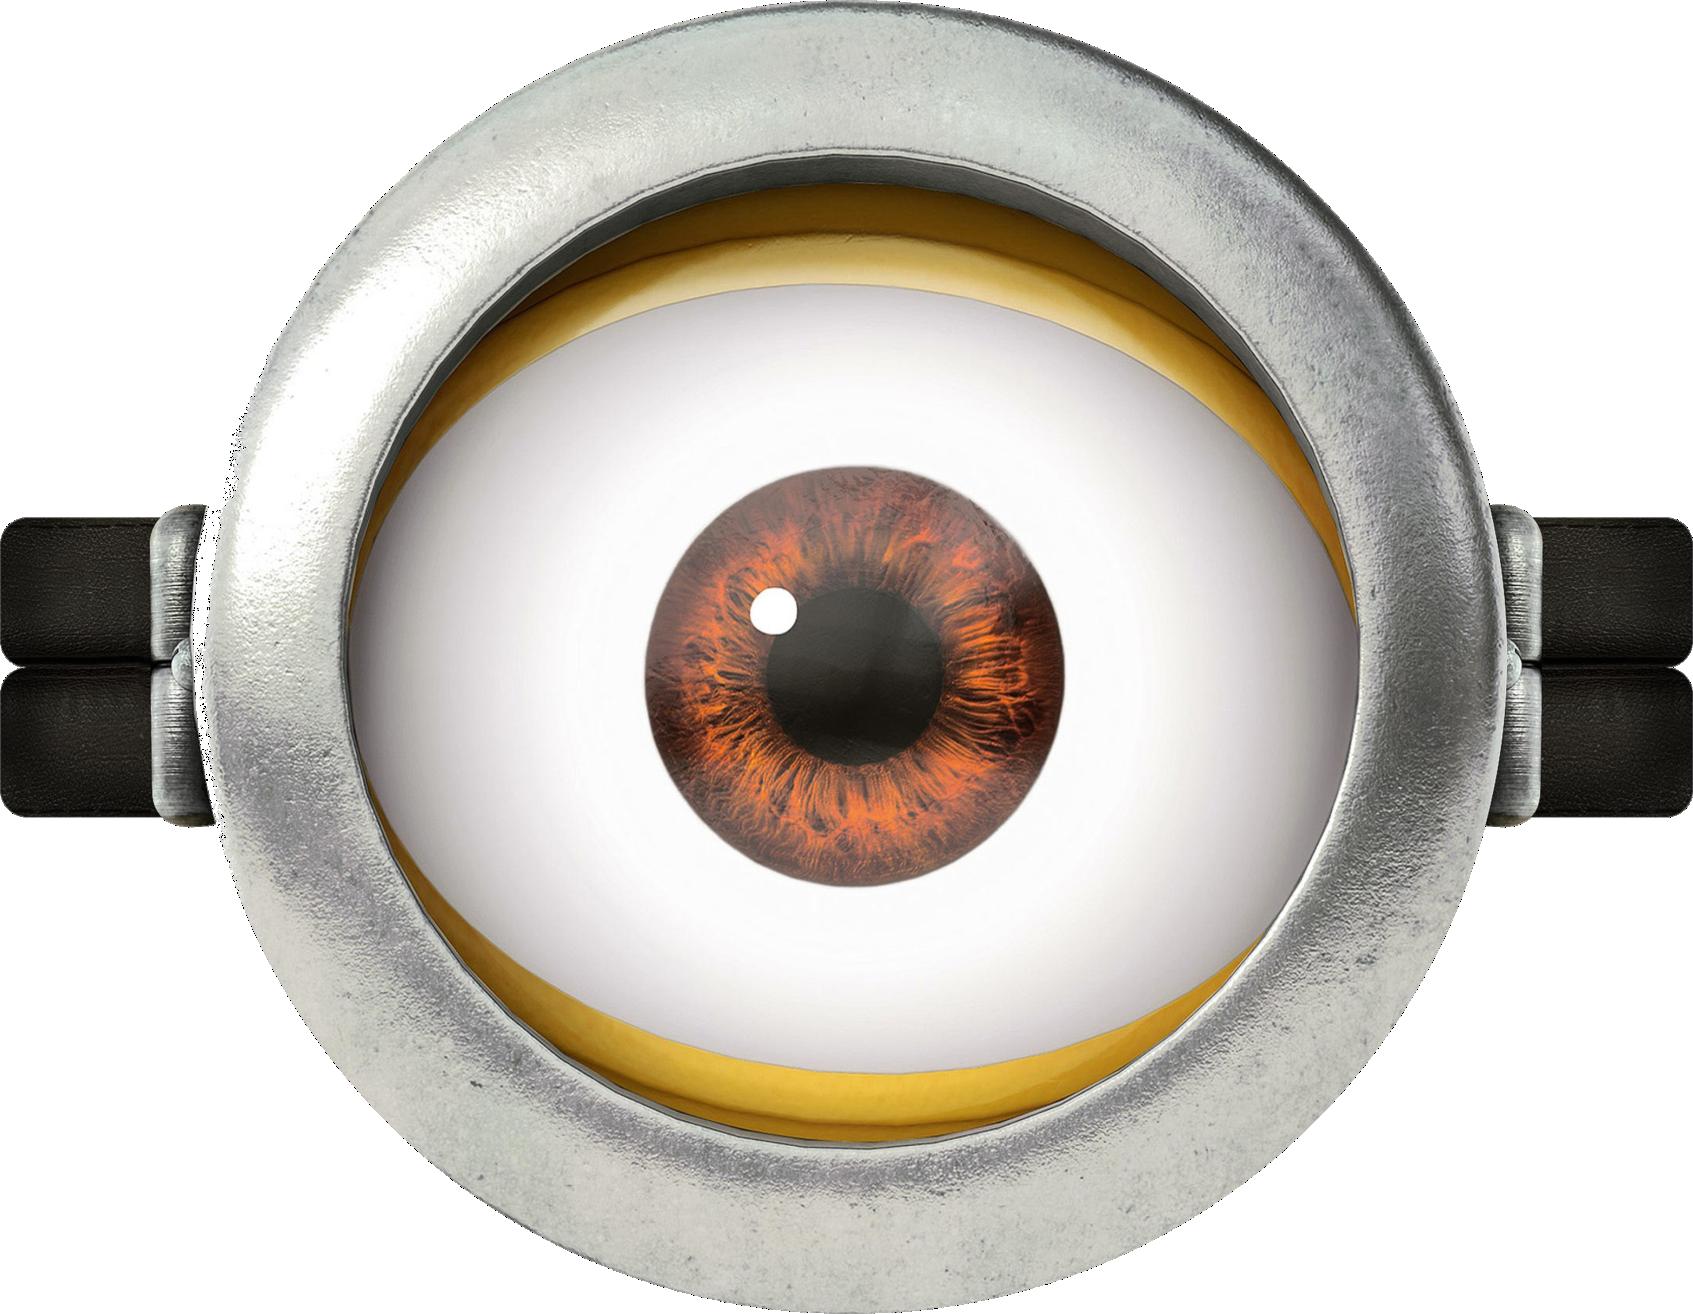 meu malvado favorito olho png imagens e moldes com br clip art of eyes looking clip art of eyes watching